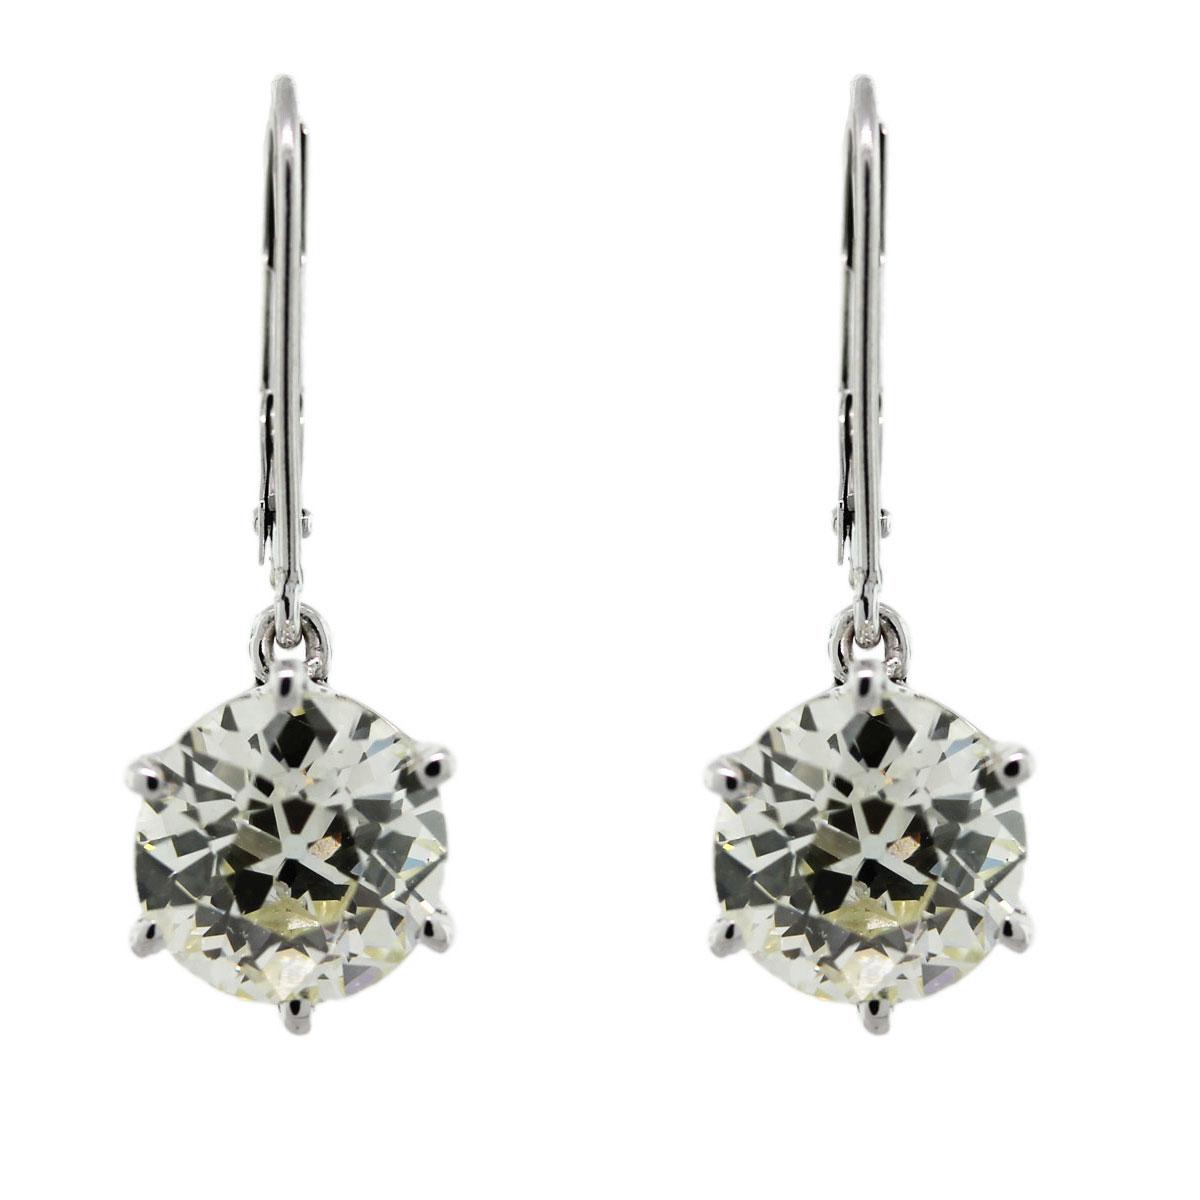 14k White Gold 5 Carat European Cut Diamond Drop Earrings